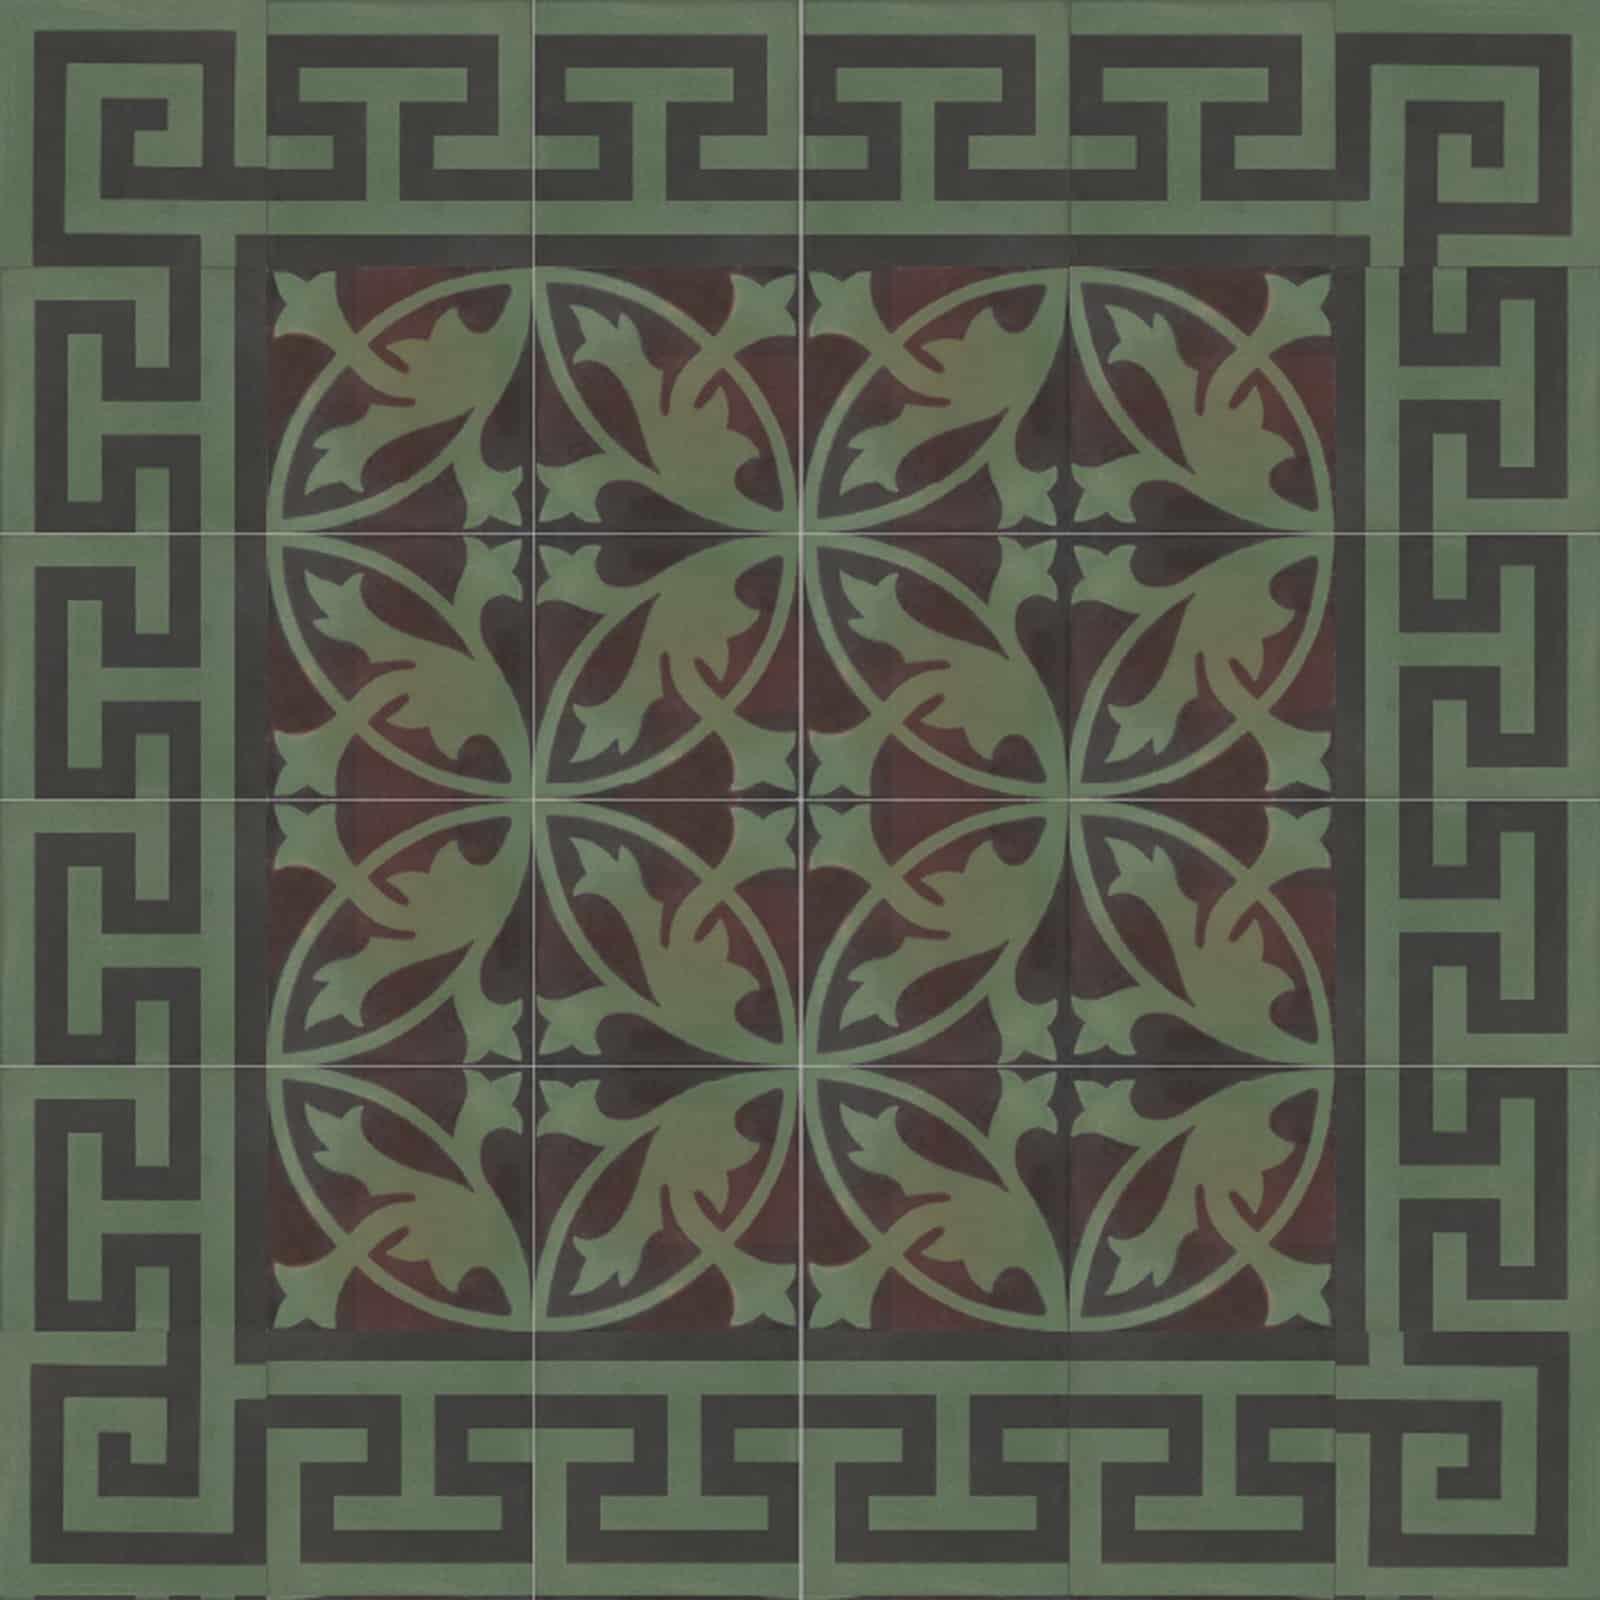 zementfliesen-verlegemuster-nummer-10853-viaplatten | 10853